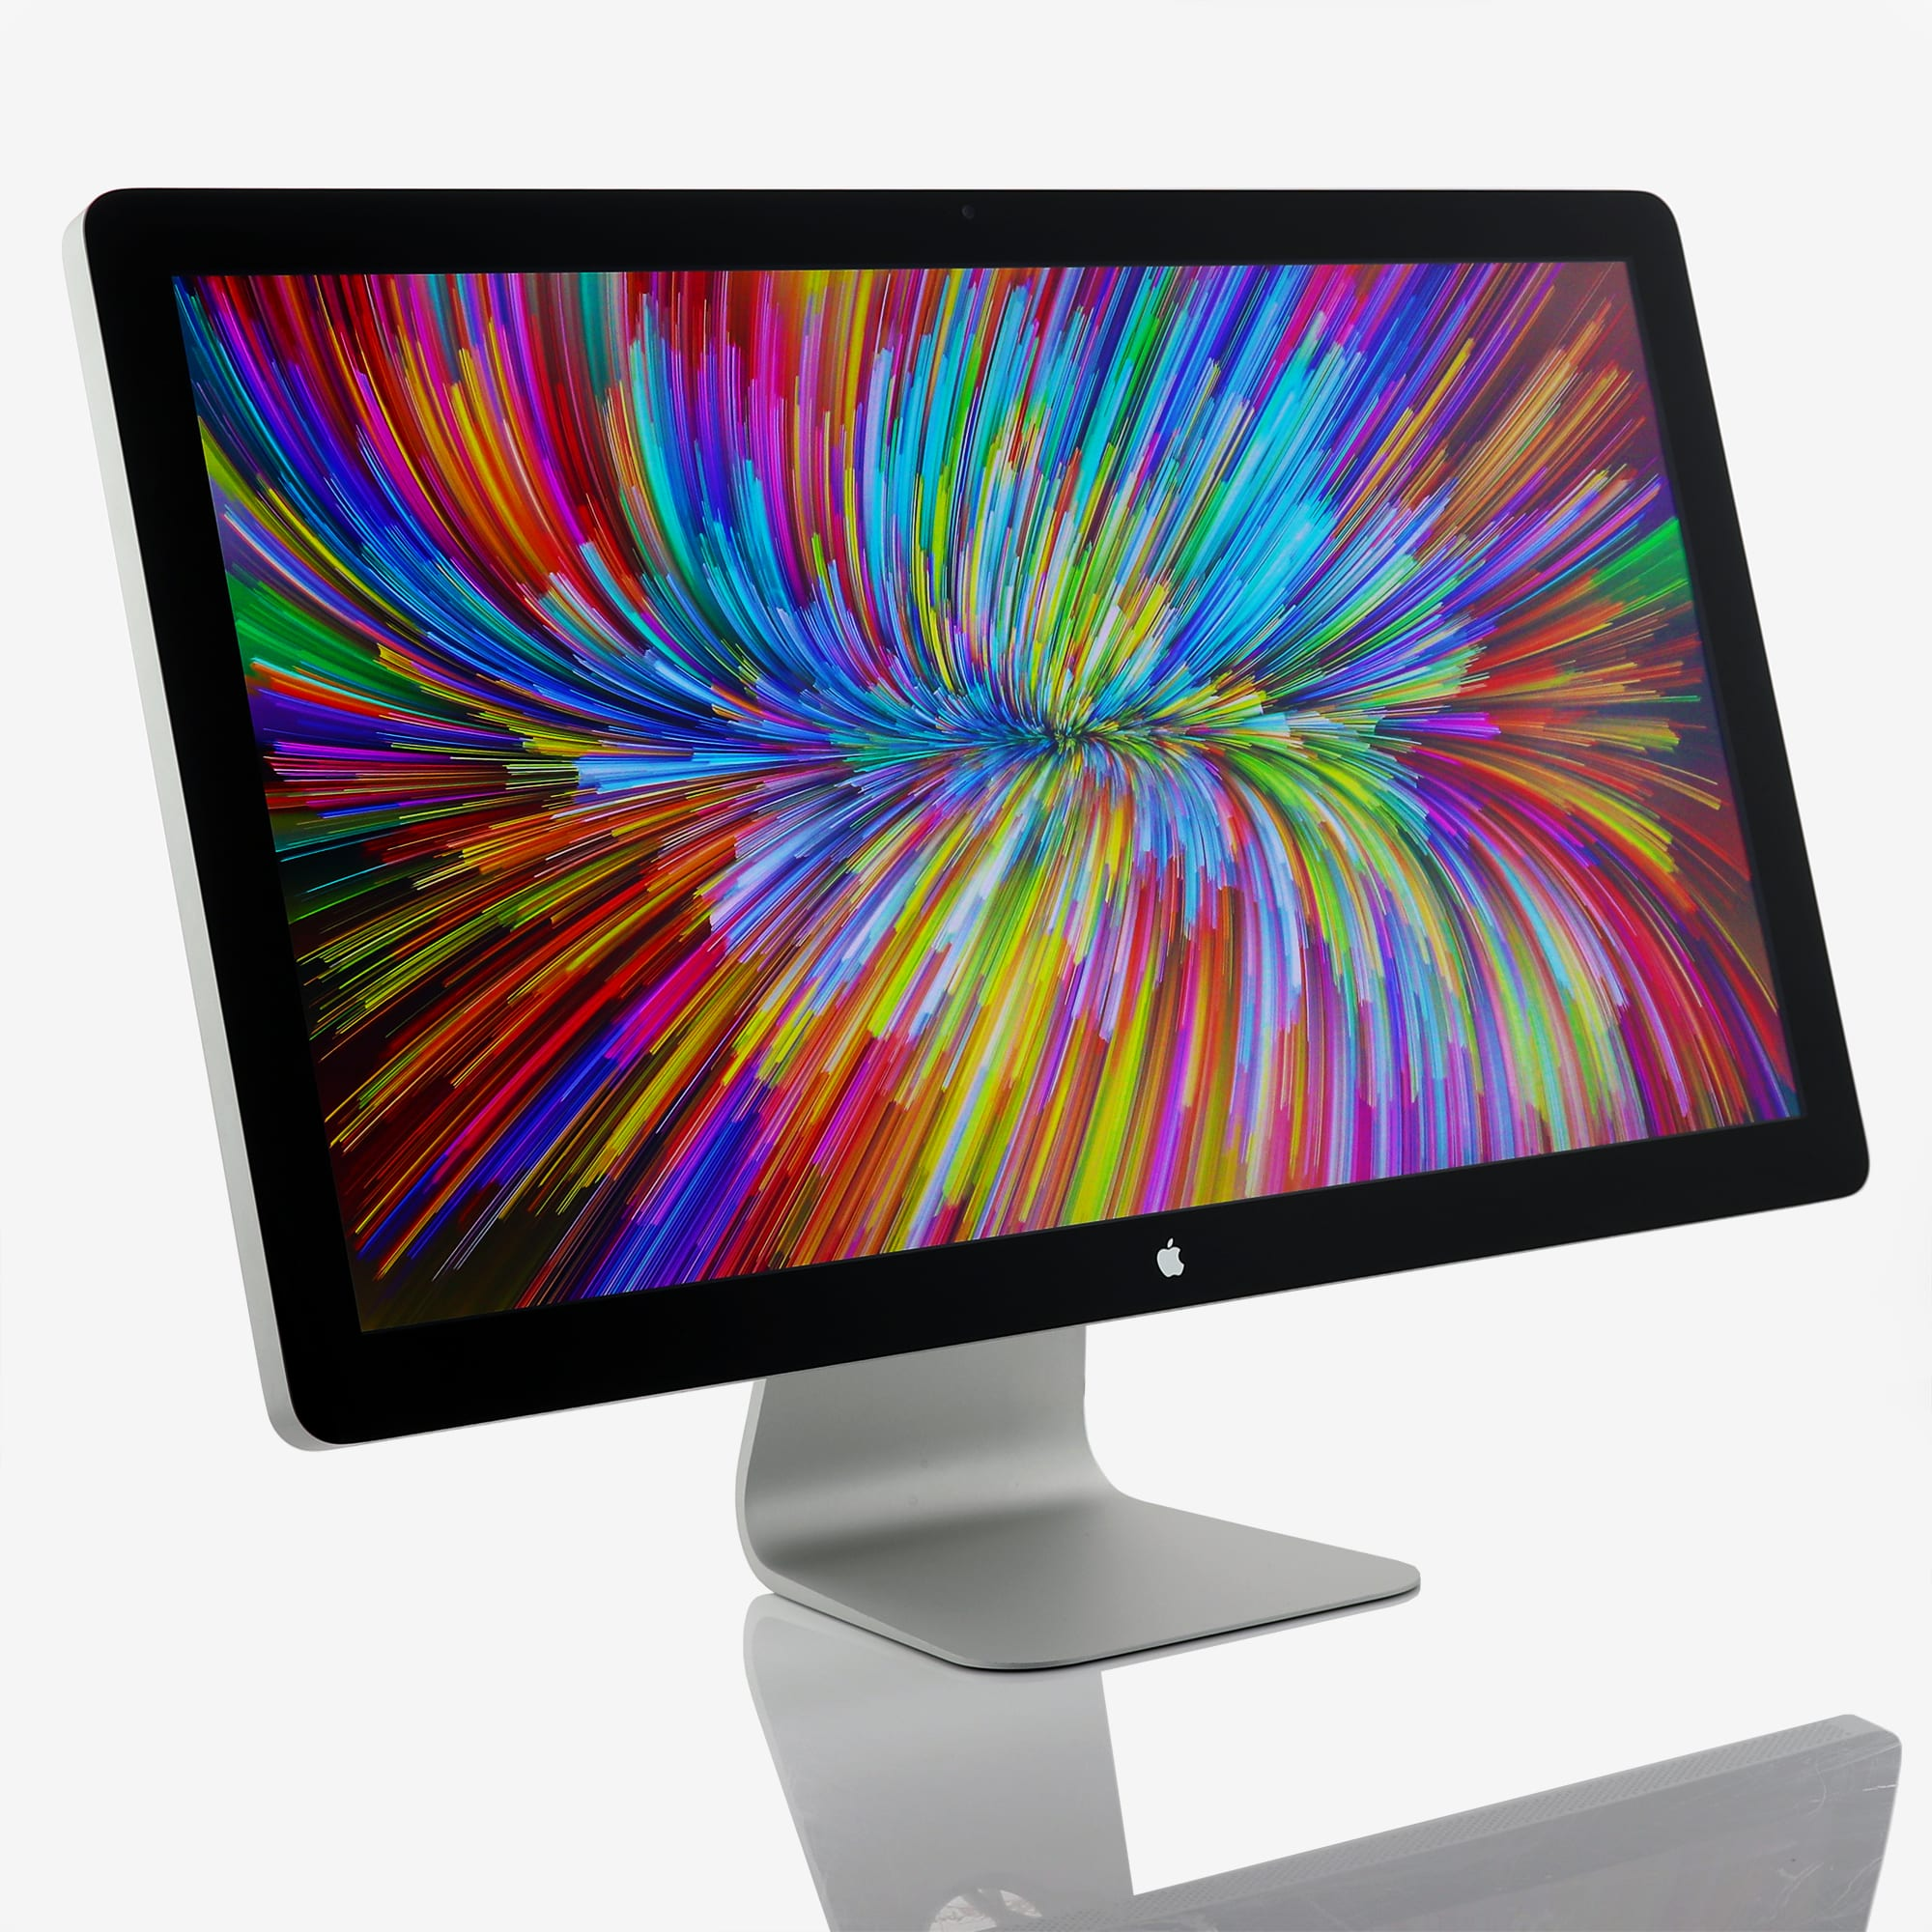 1 x Apple LED Cinema Display 27-inch